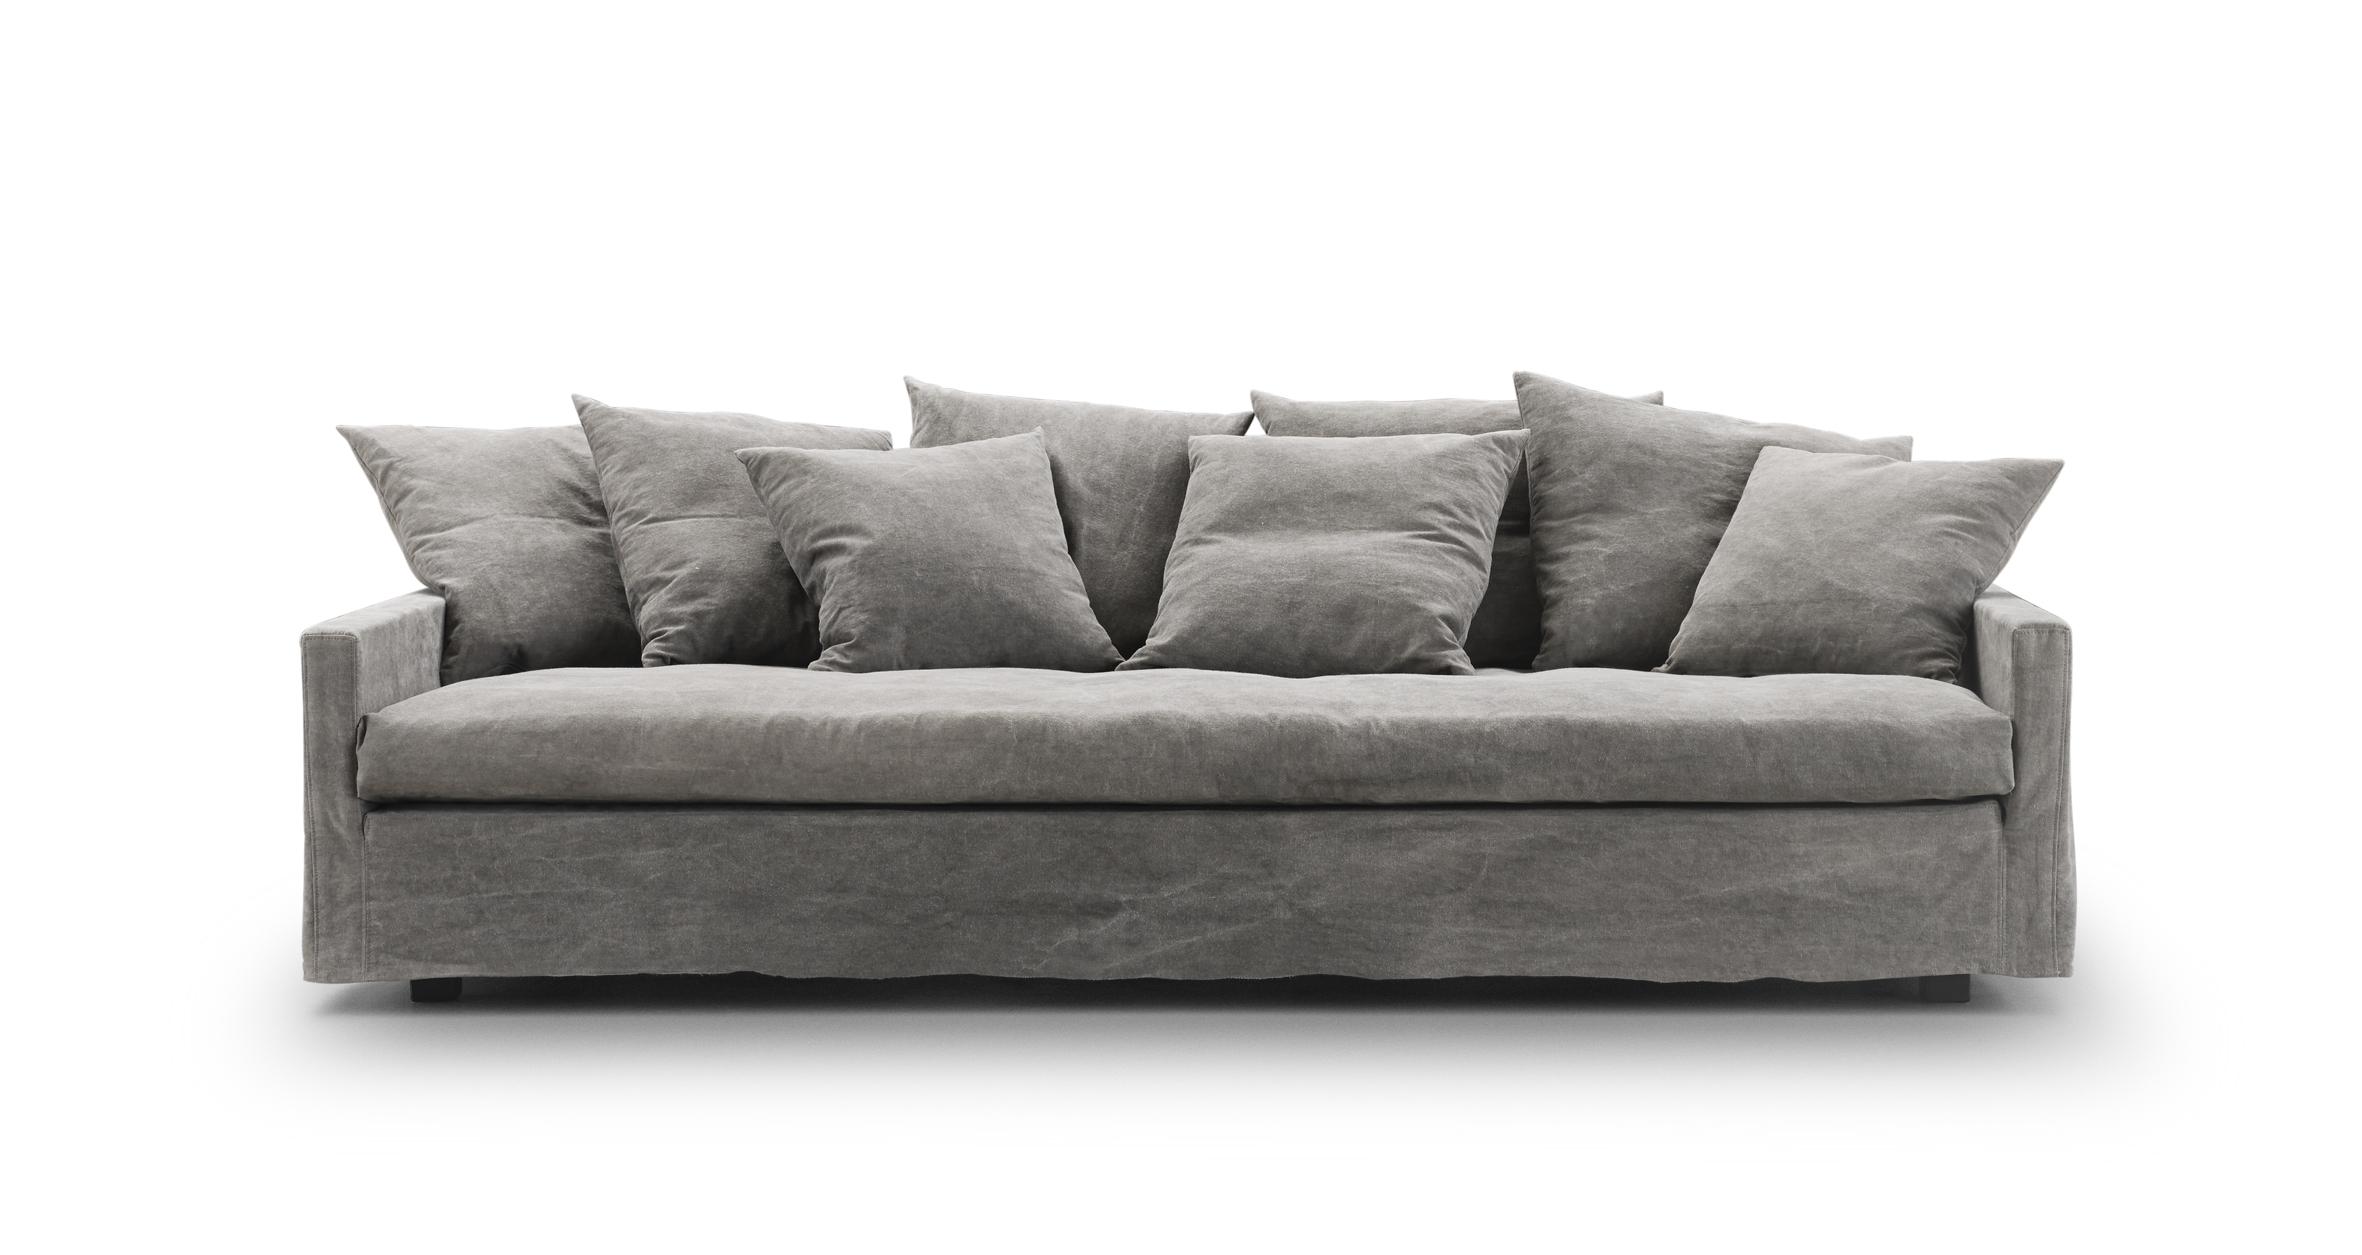 soffa med djup sits - Djup Soffa 3sits Soffa Soffa 100 4 Sits Med Fotpall Linne Grov2 Attic Living Area In Grey Via